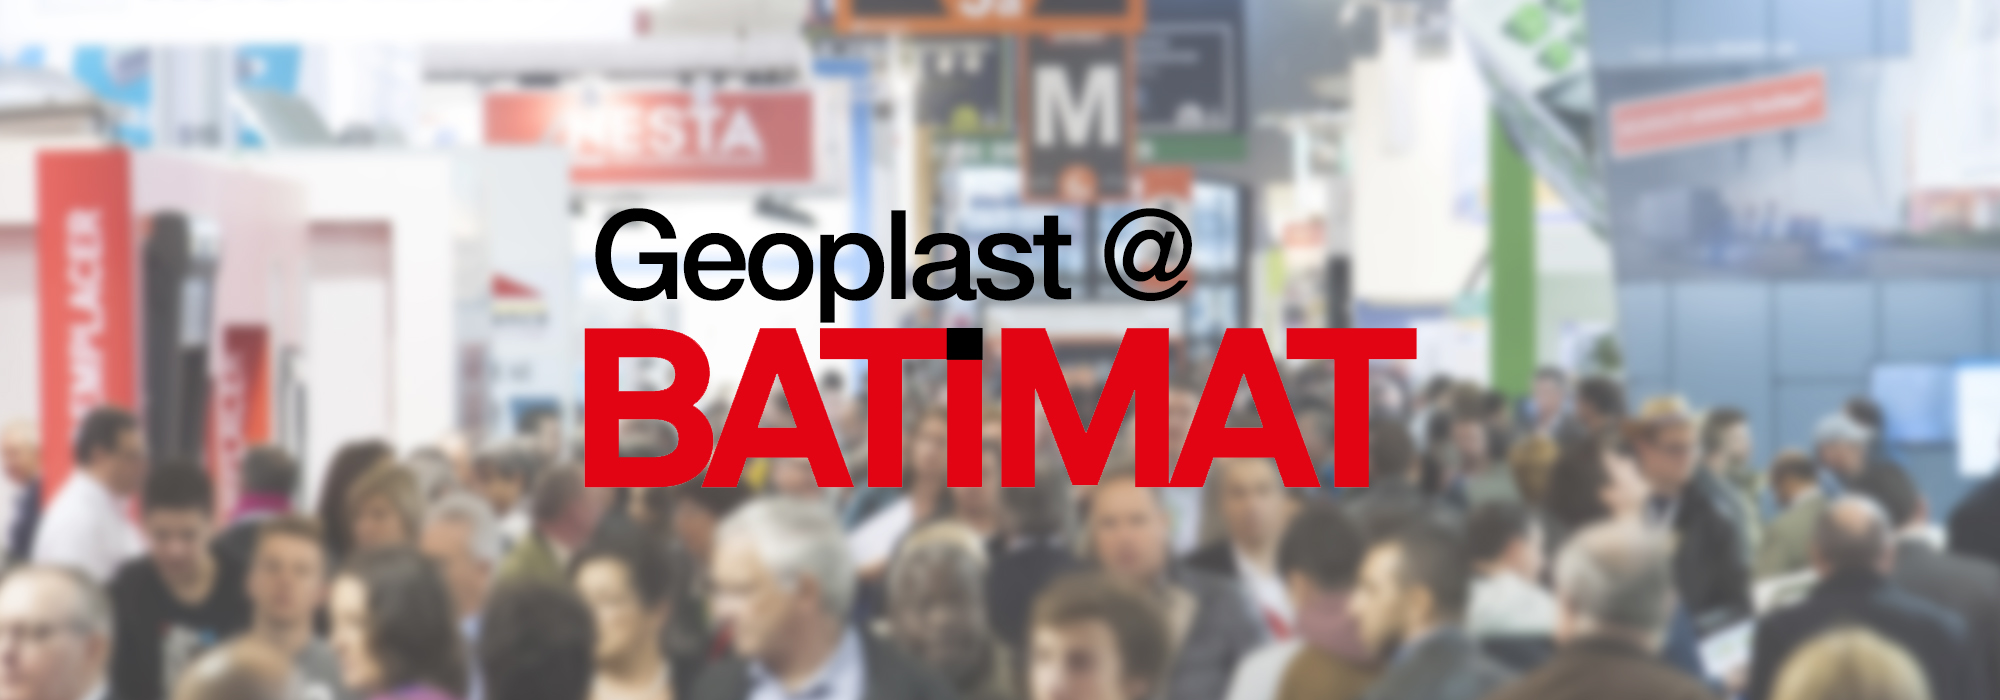 Geoplast Batimat 2019